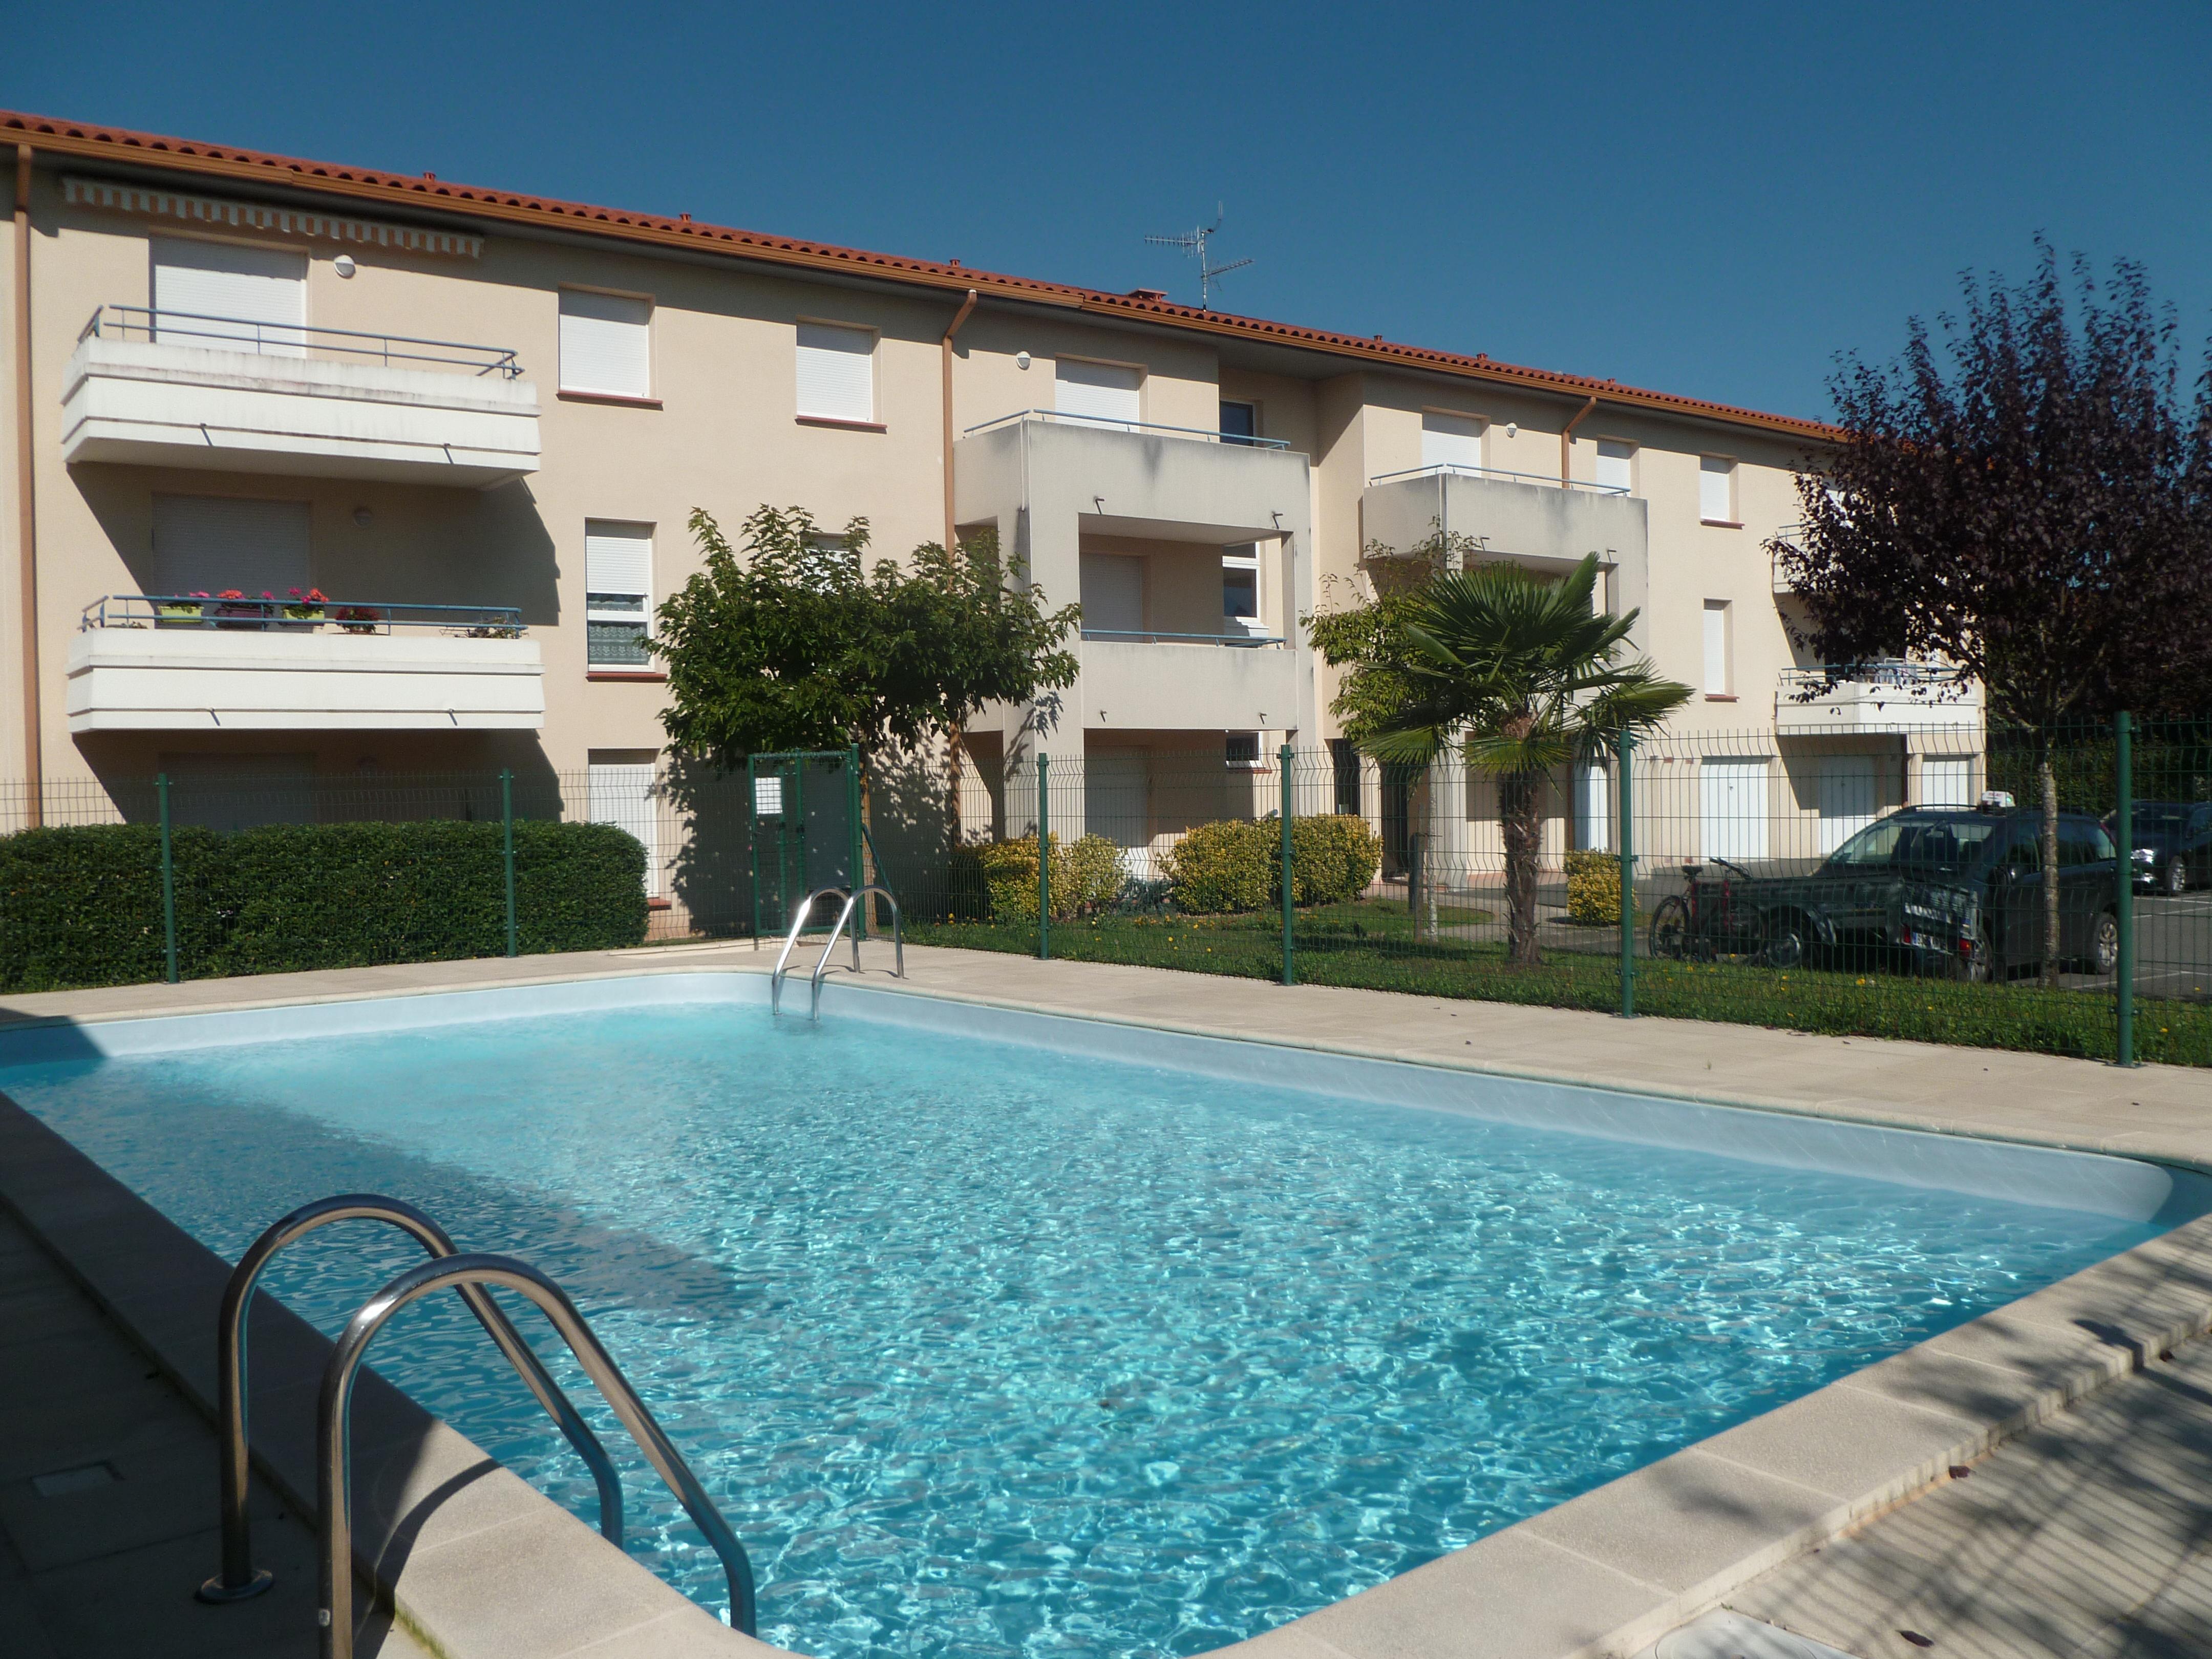 Appartement t3 en r sidence vendre figeac bienvenu for Capdenac piscine